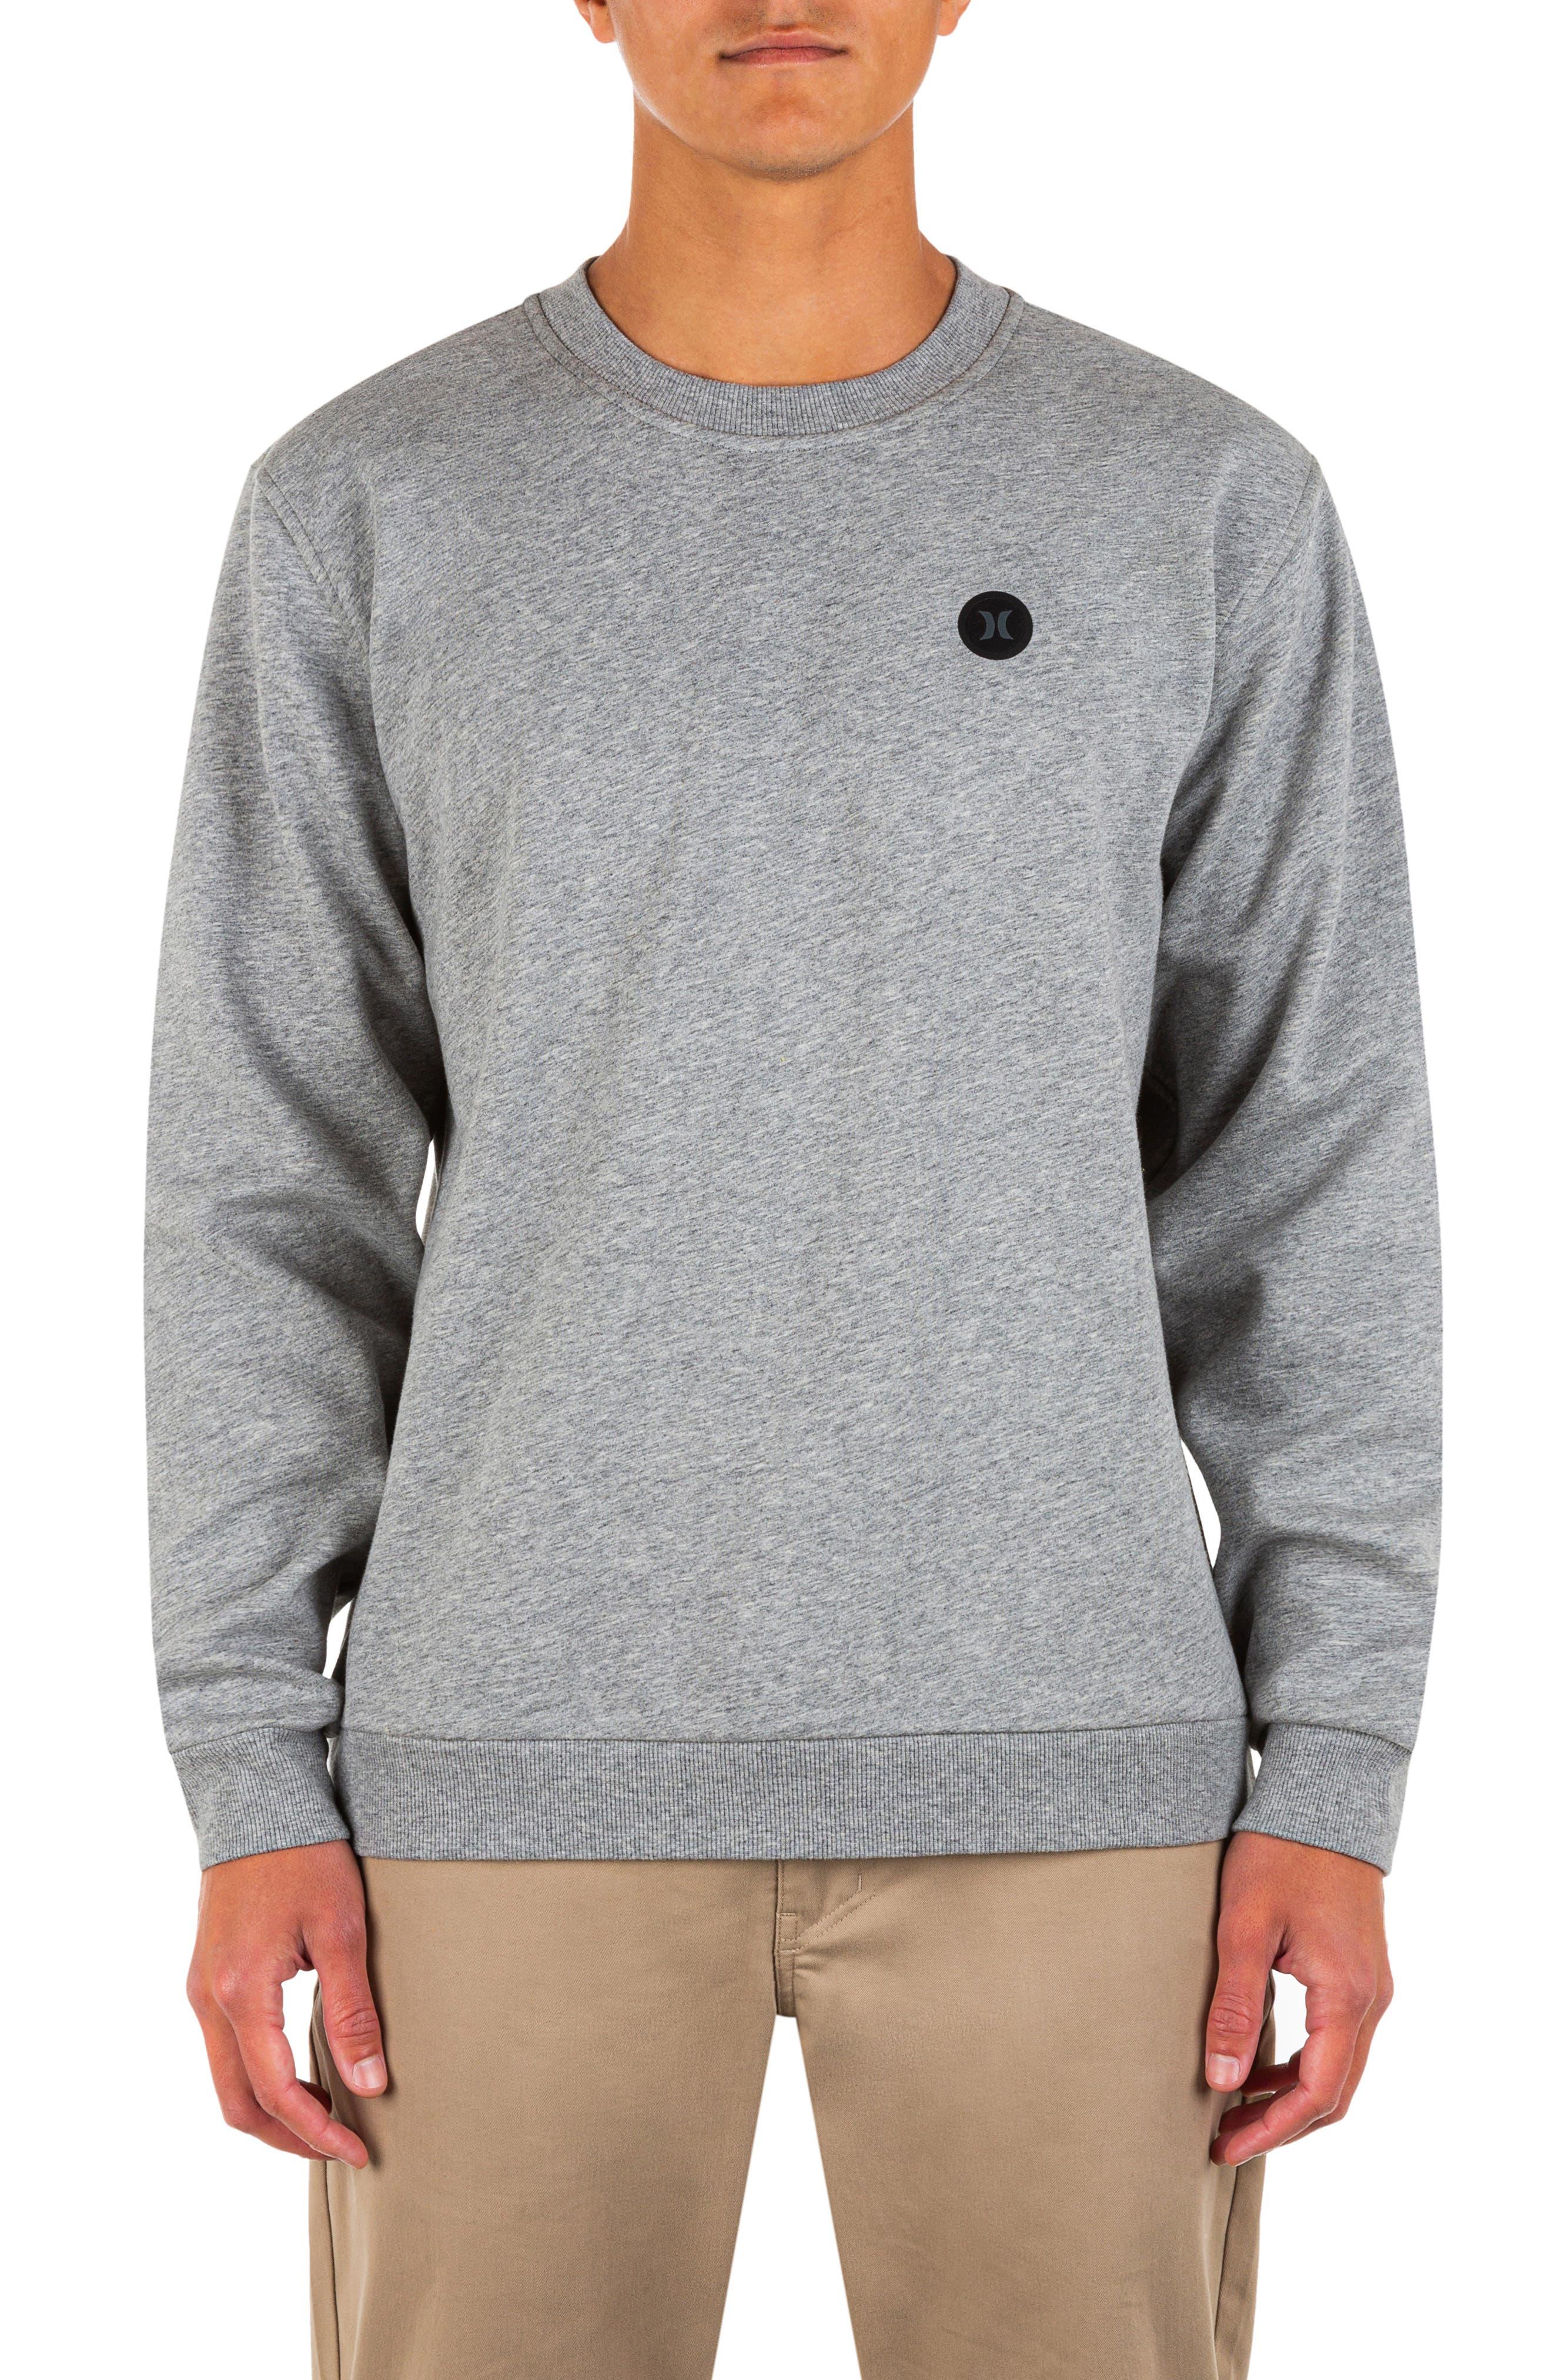 Cape Town Heat Crewneck Sweatshirt